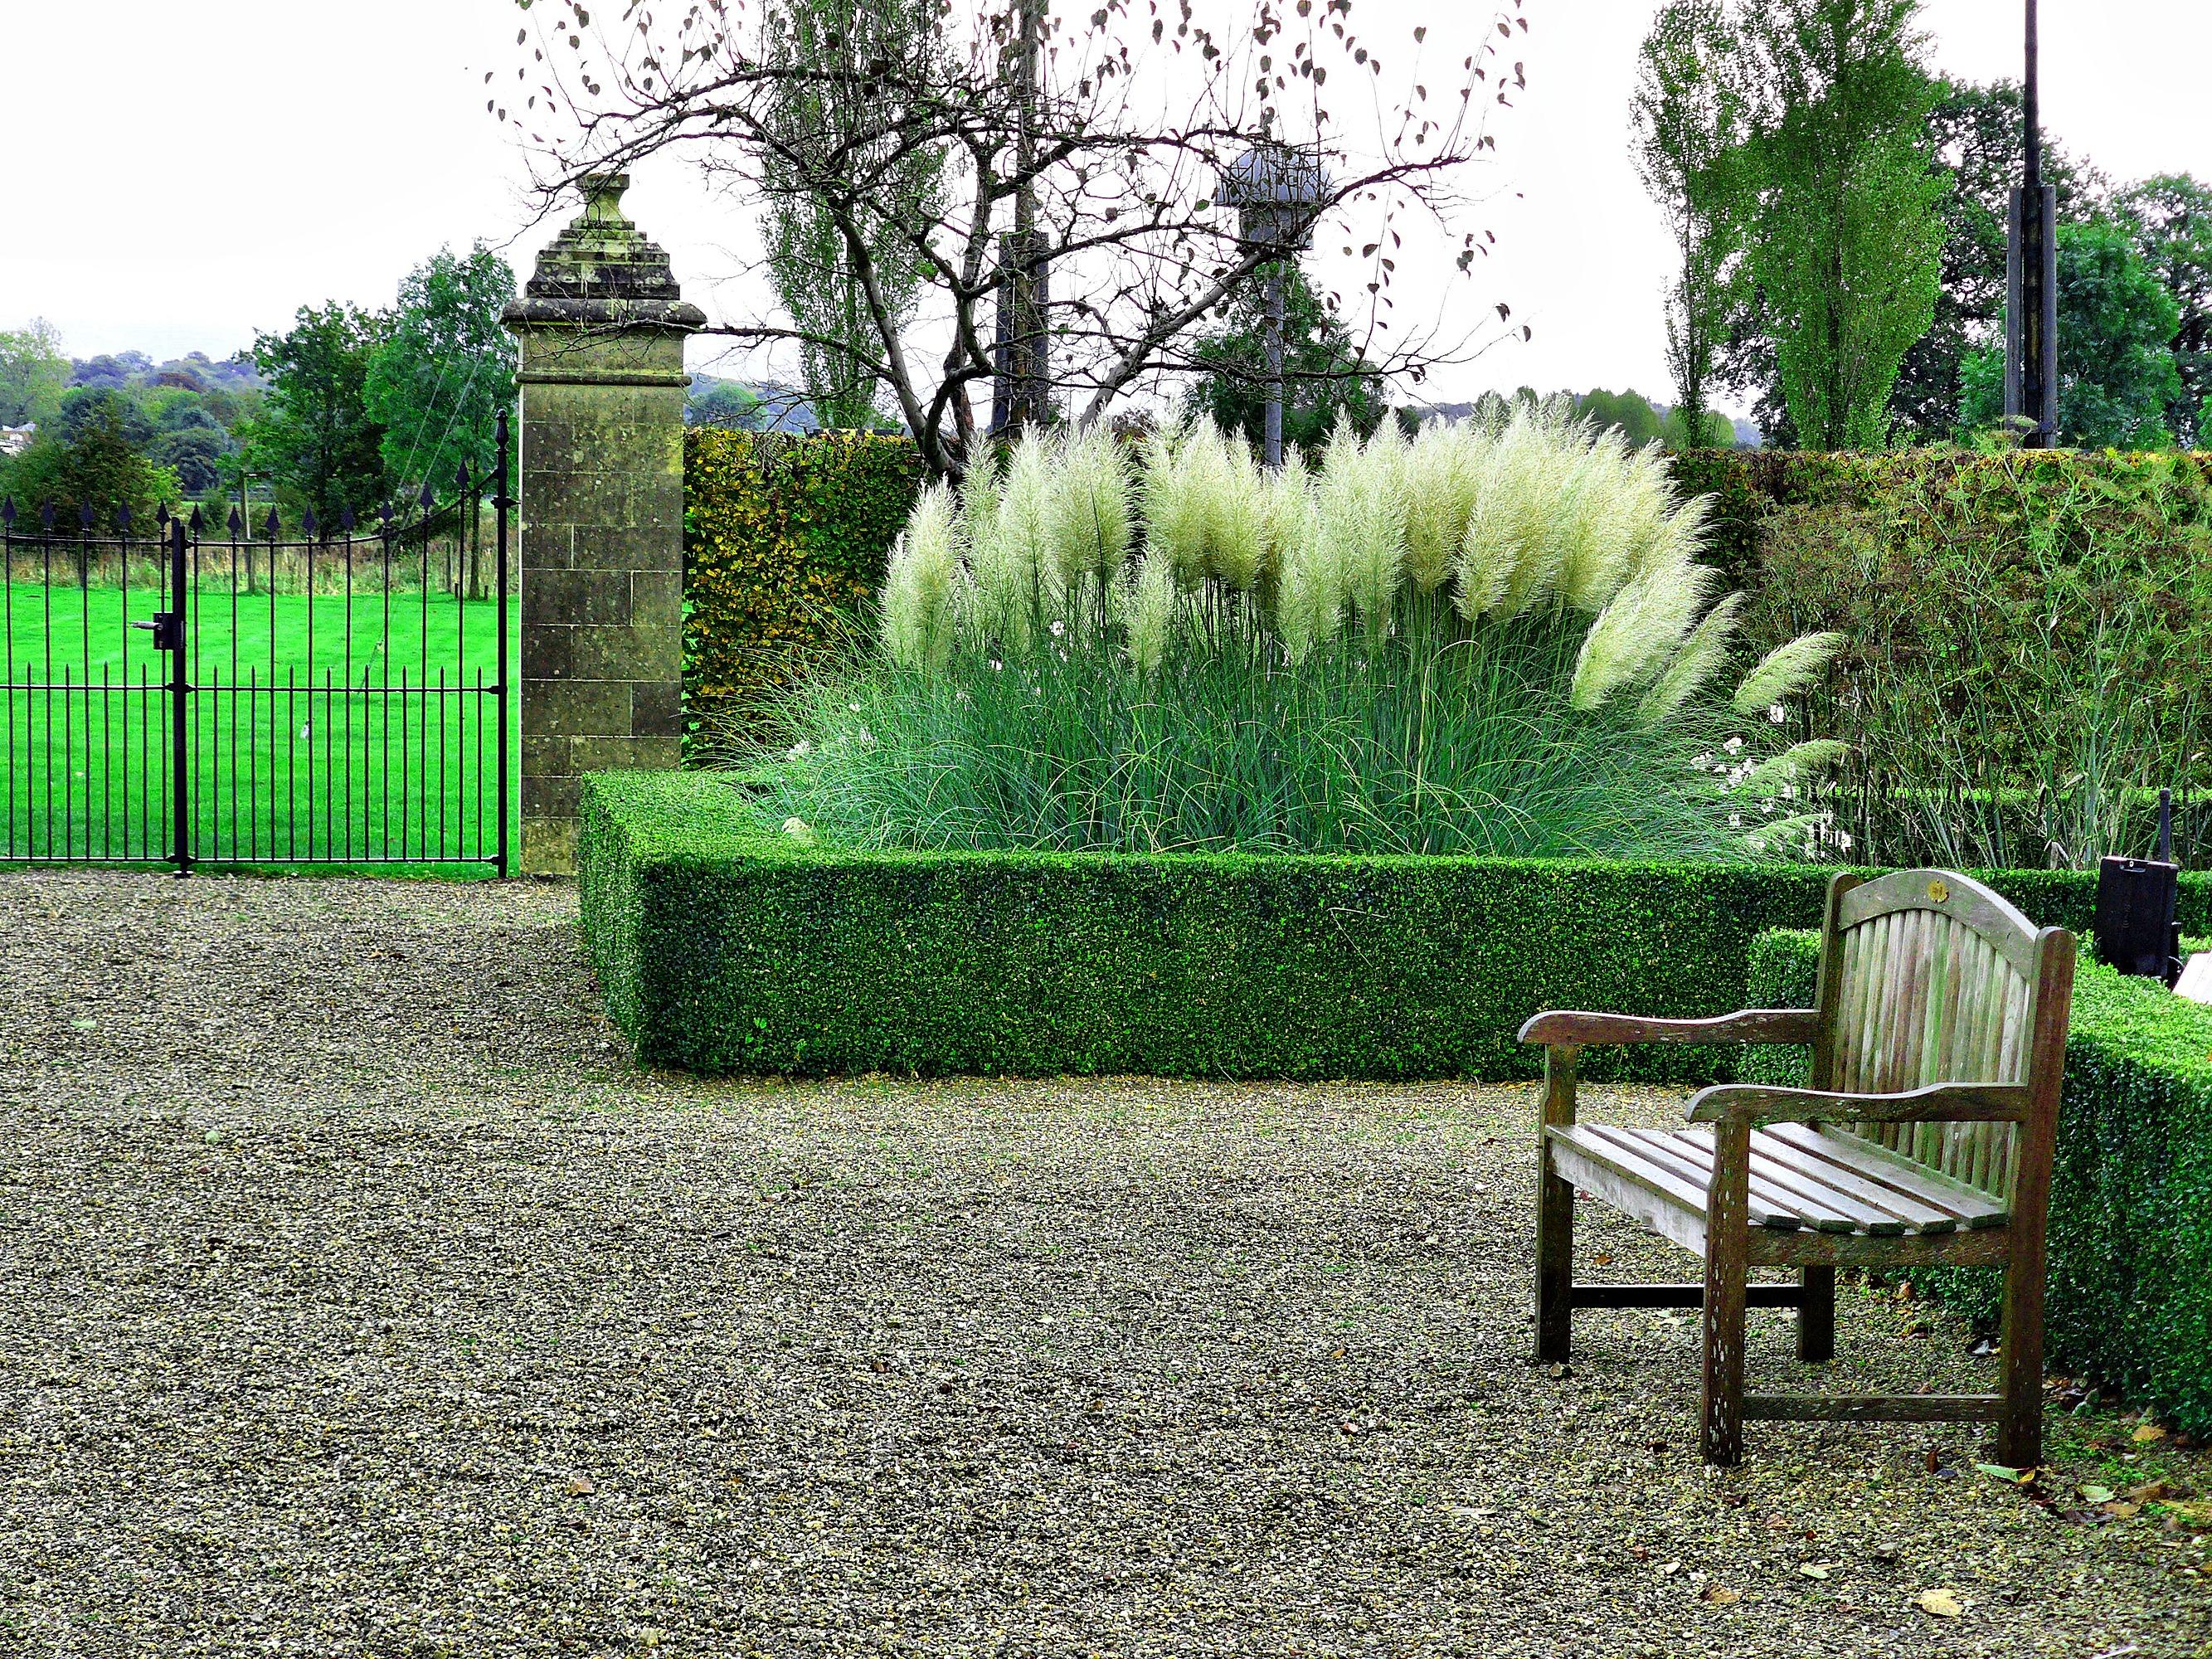 Kostenlose foto Landschaft Baum Natur Gras Zaun Bank Rasen